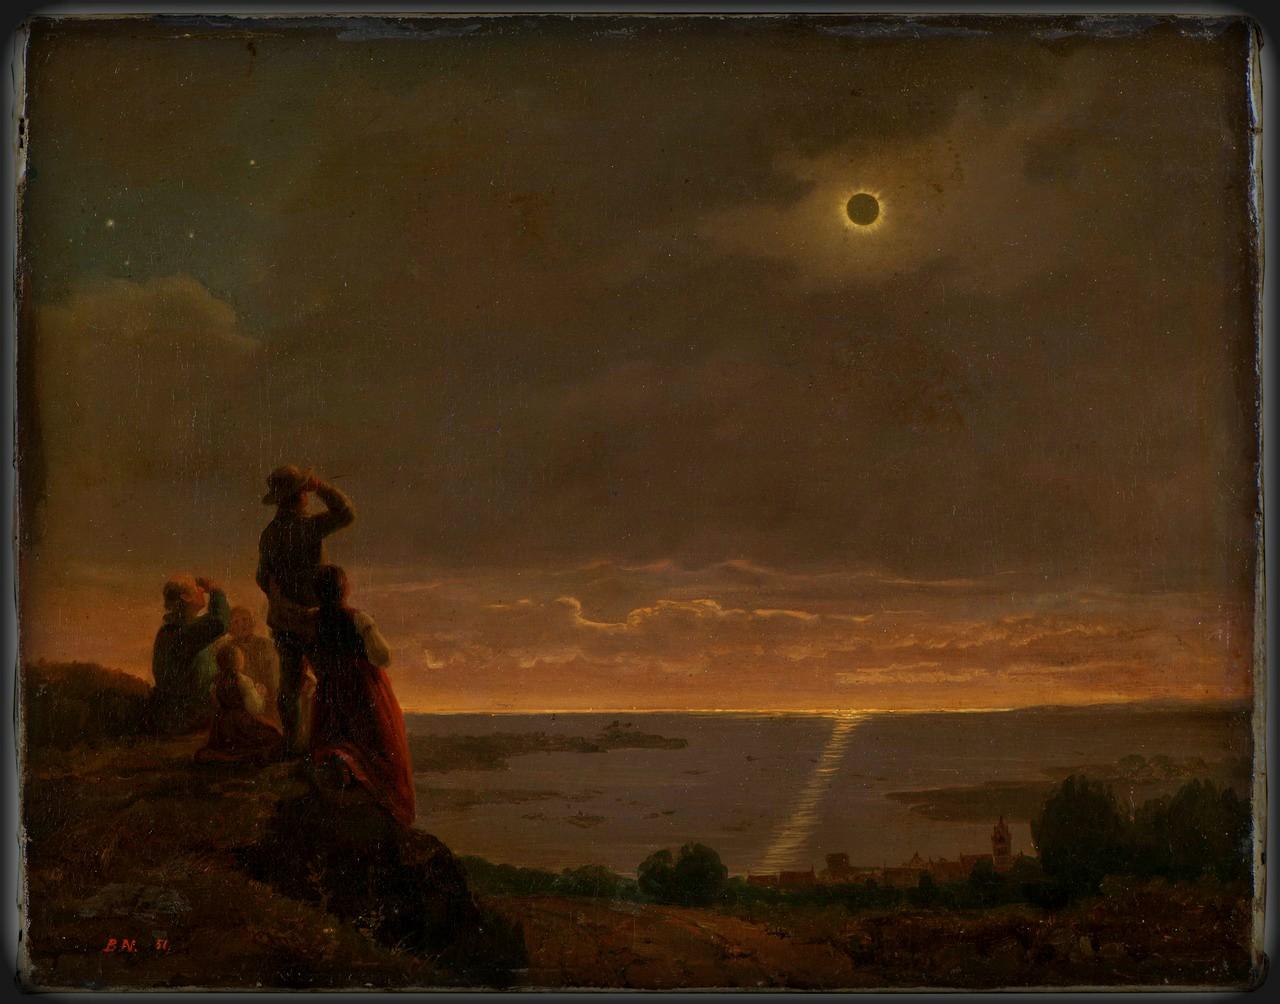 Solar Eclipse, Bengt Nordenberg, 1851. Image: Wikipedia.